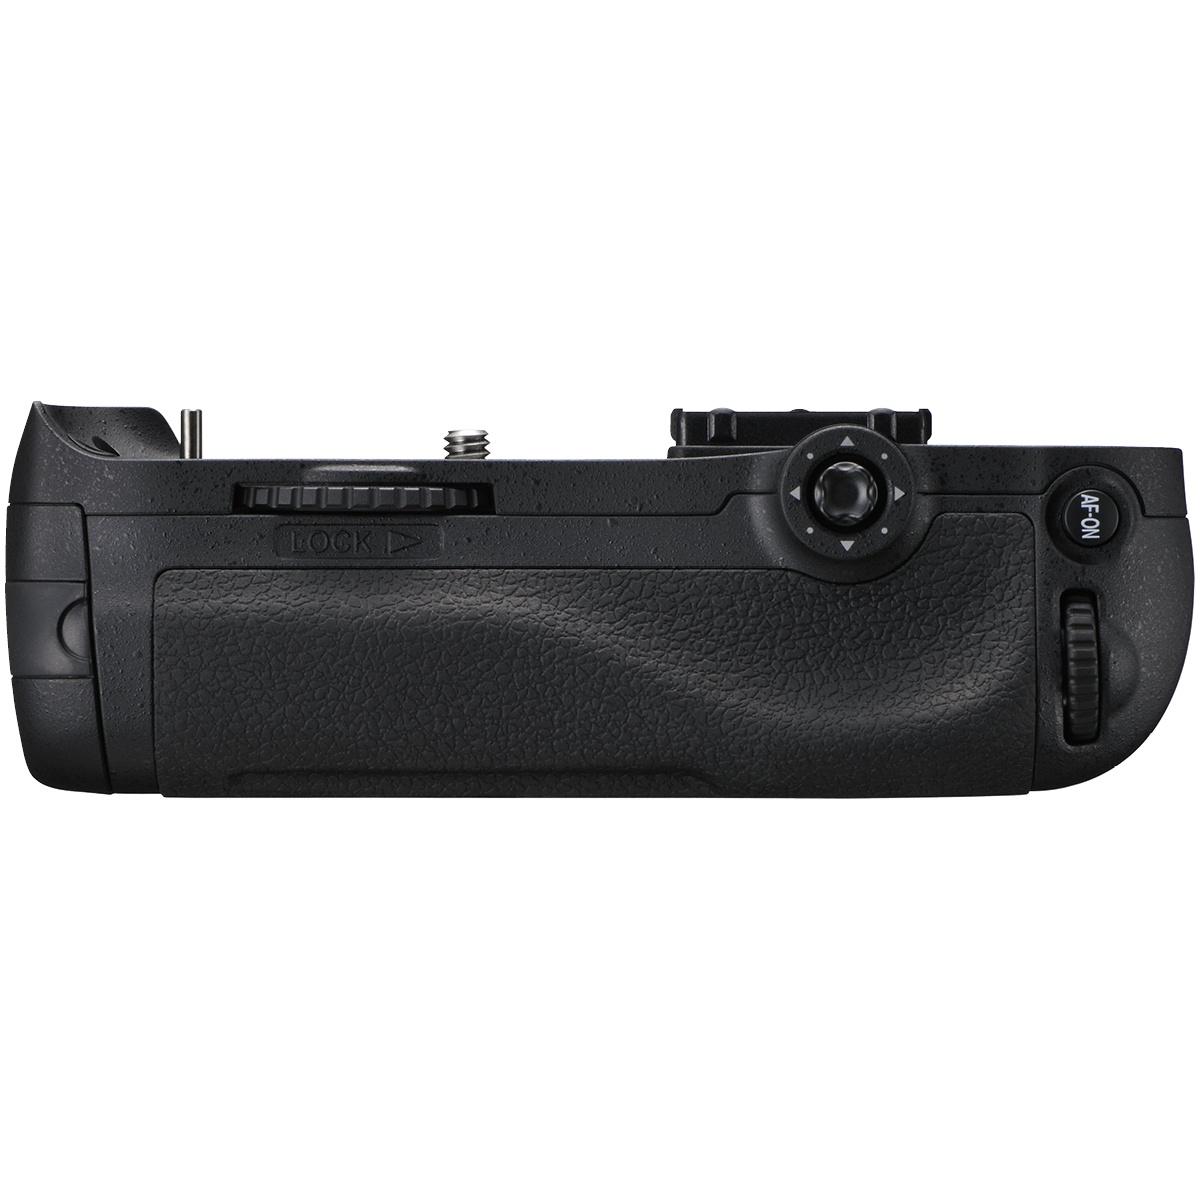 Nikon MB-D12 Multifunktions-Batteriehandgriff